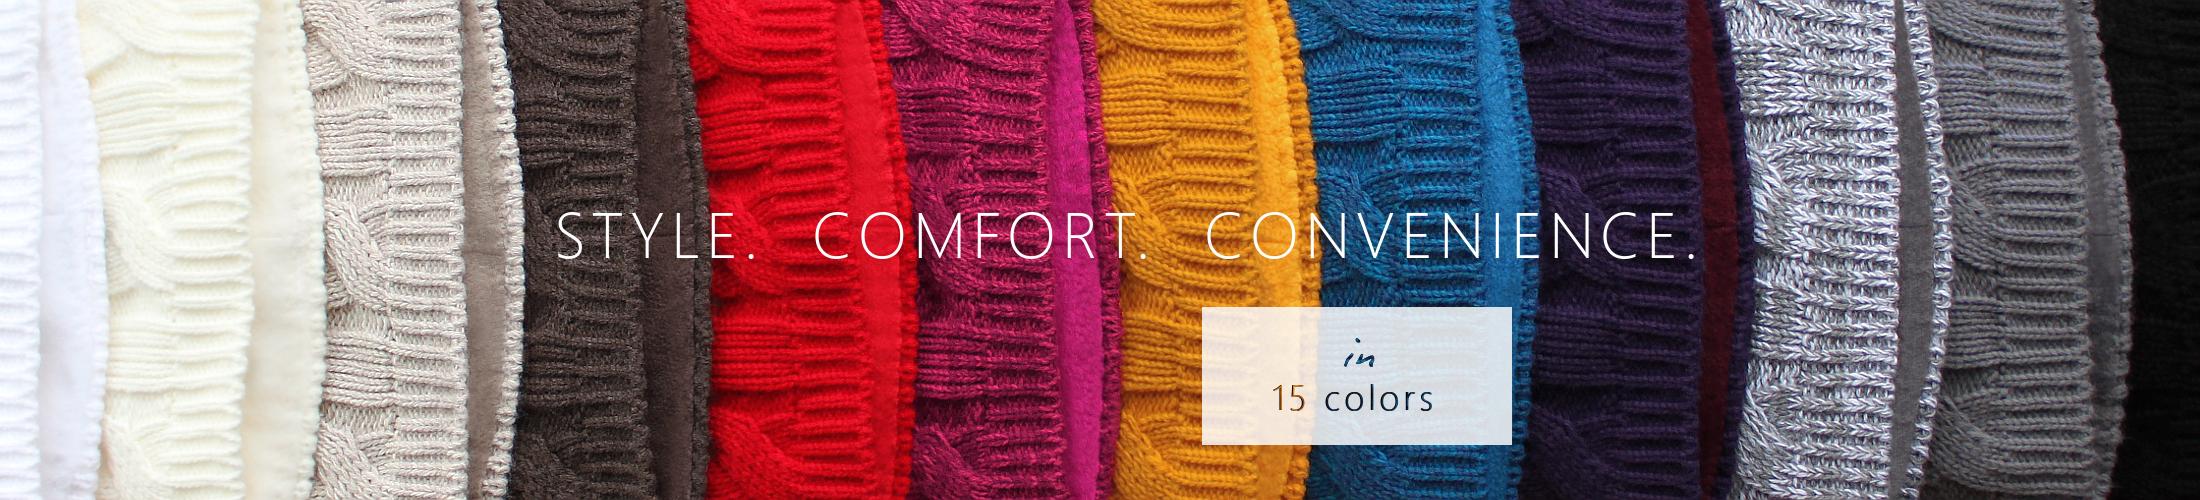 peekaboos-ponytail-hats-color-line-up-style-comfort-convenience.jpg